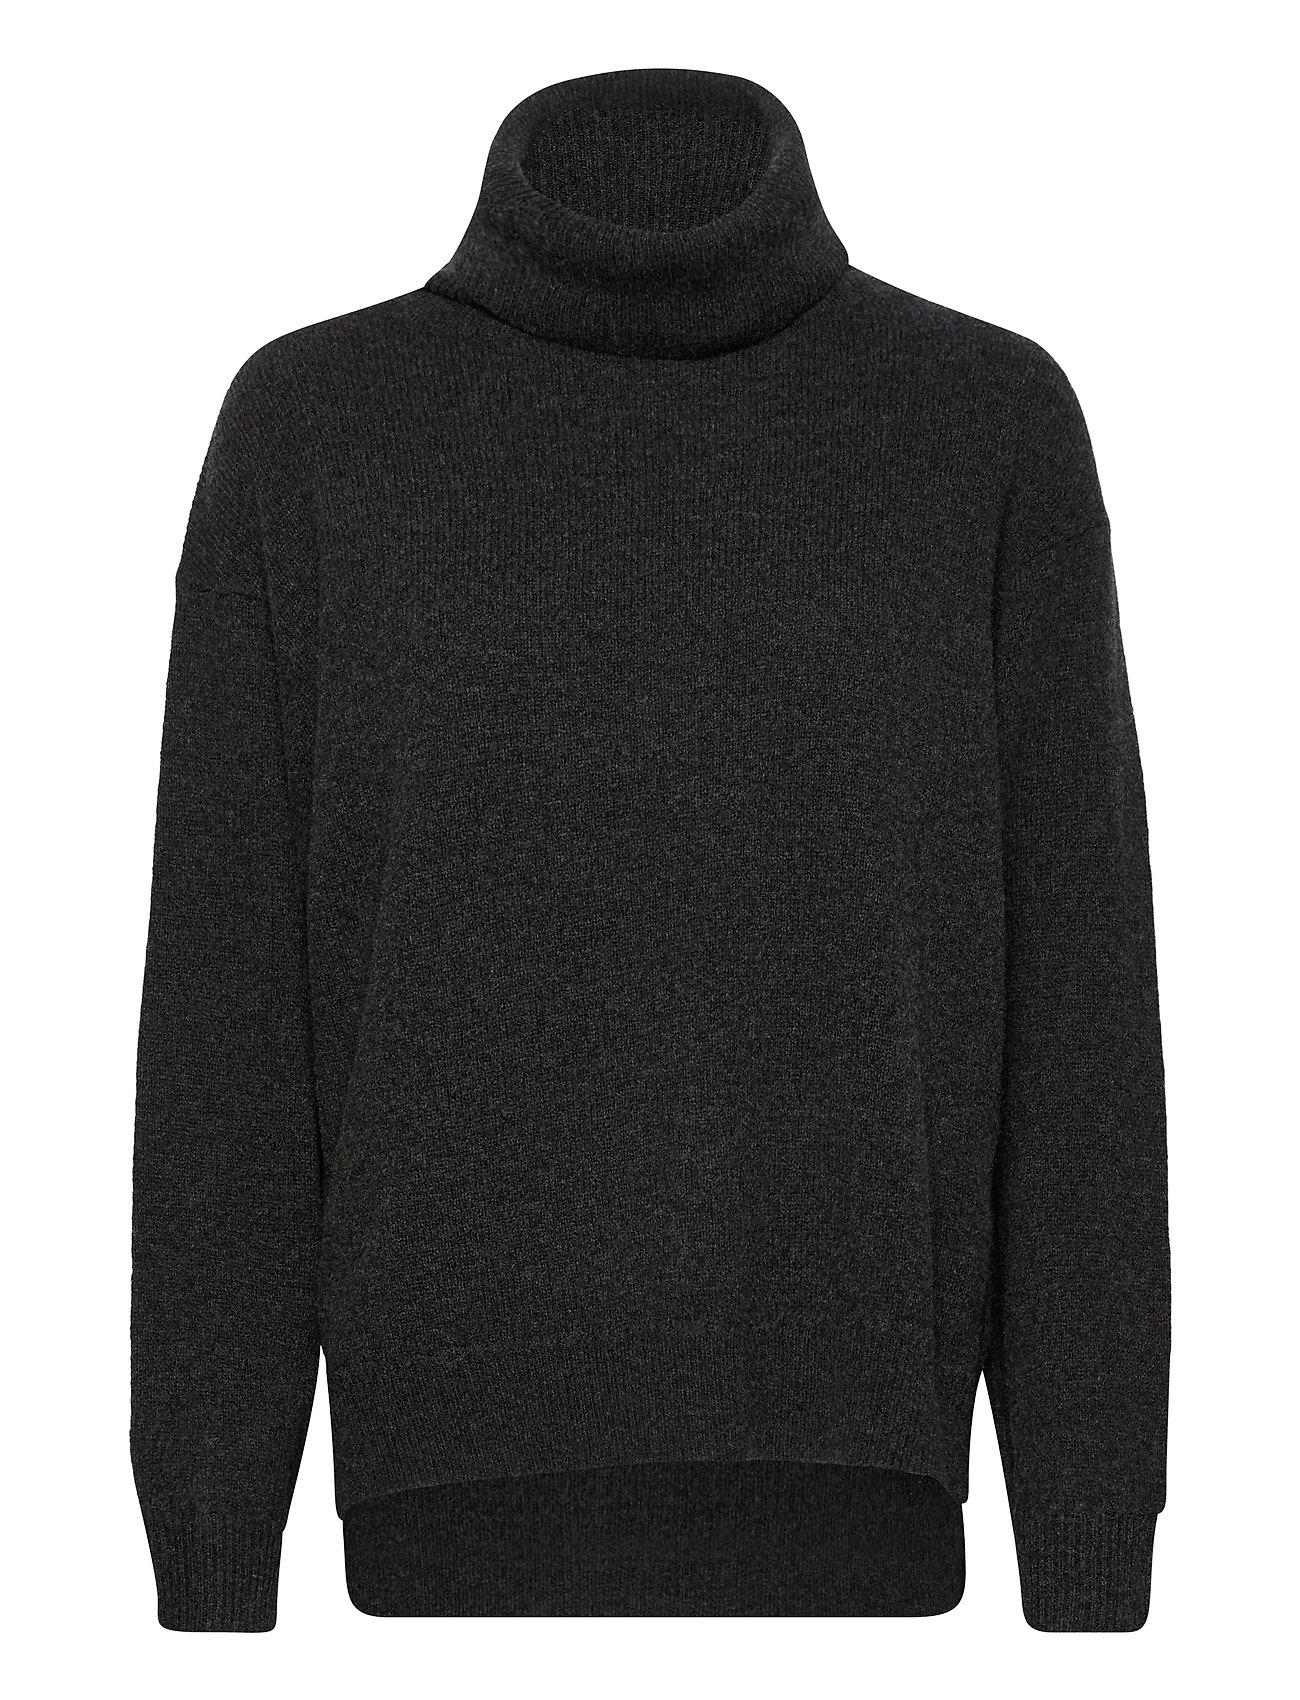 Molly Roll-Neck Sweater Turtleneck Rullekravetrøje Grå Filippa K